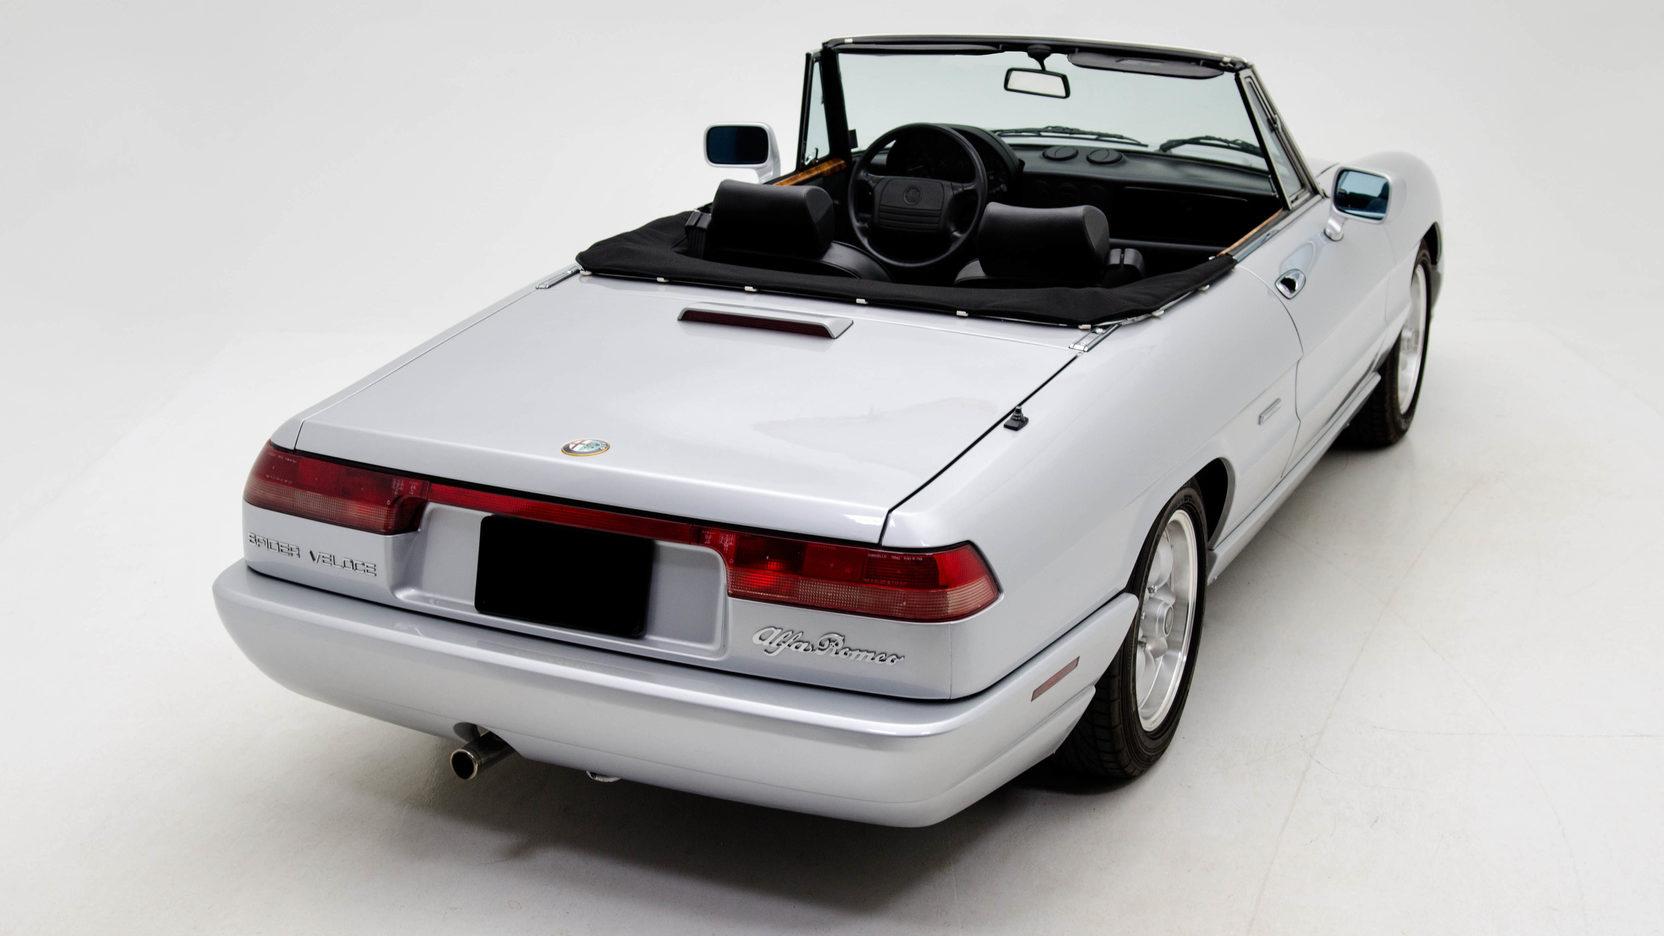 1991 Alfa Romeo Spider rear 3/4